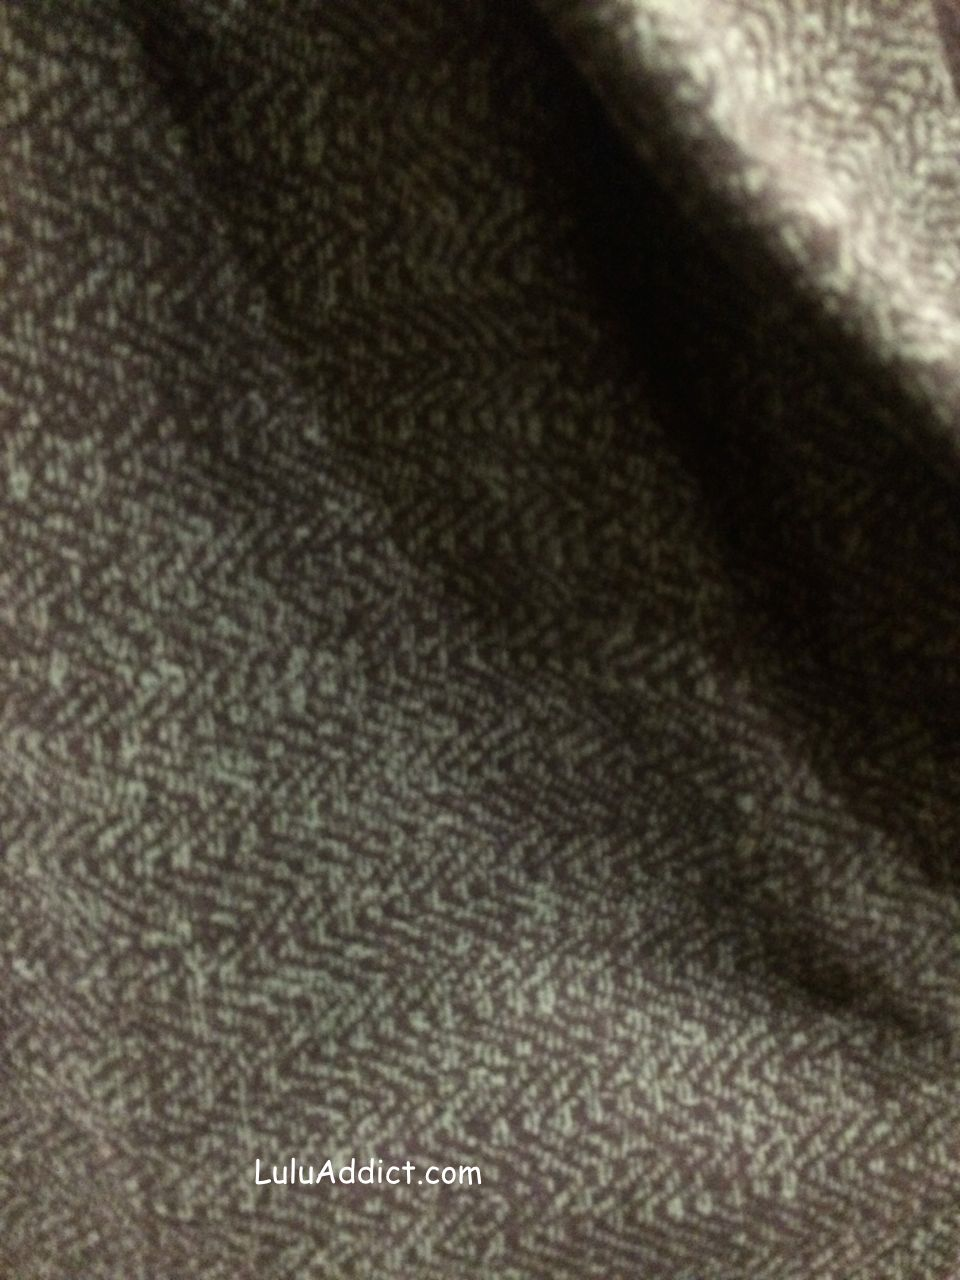 lululemon cozy car coat